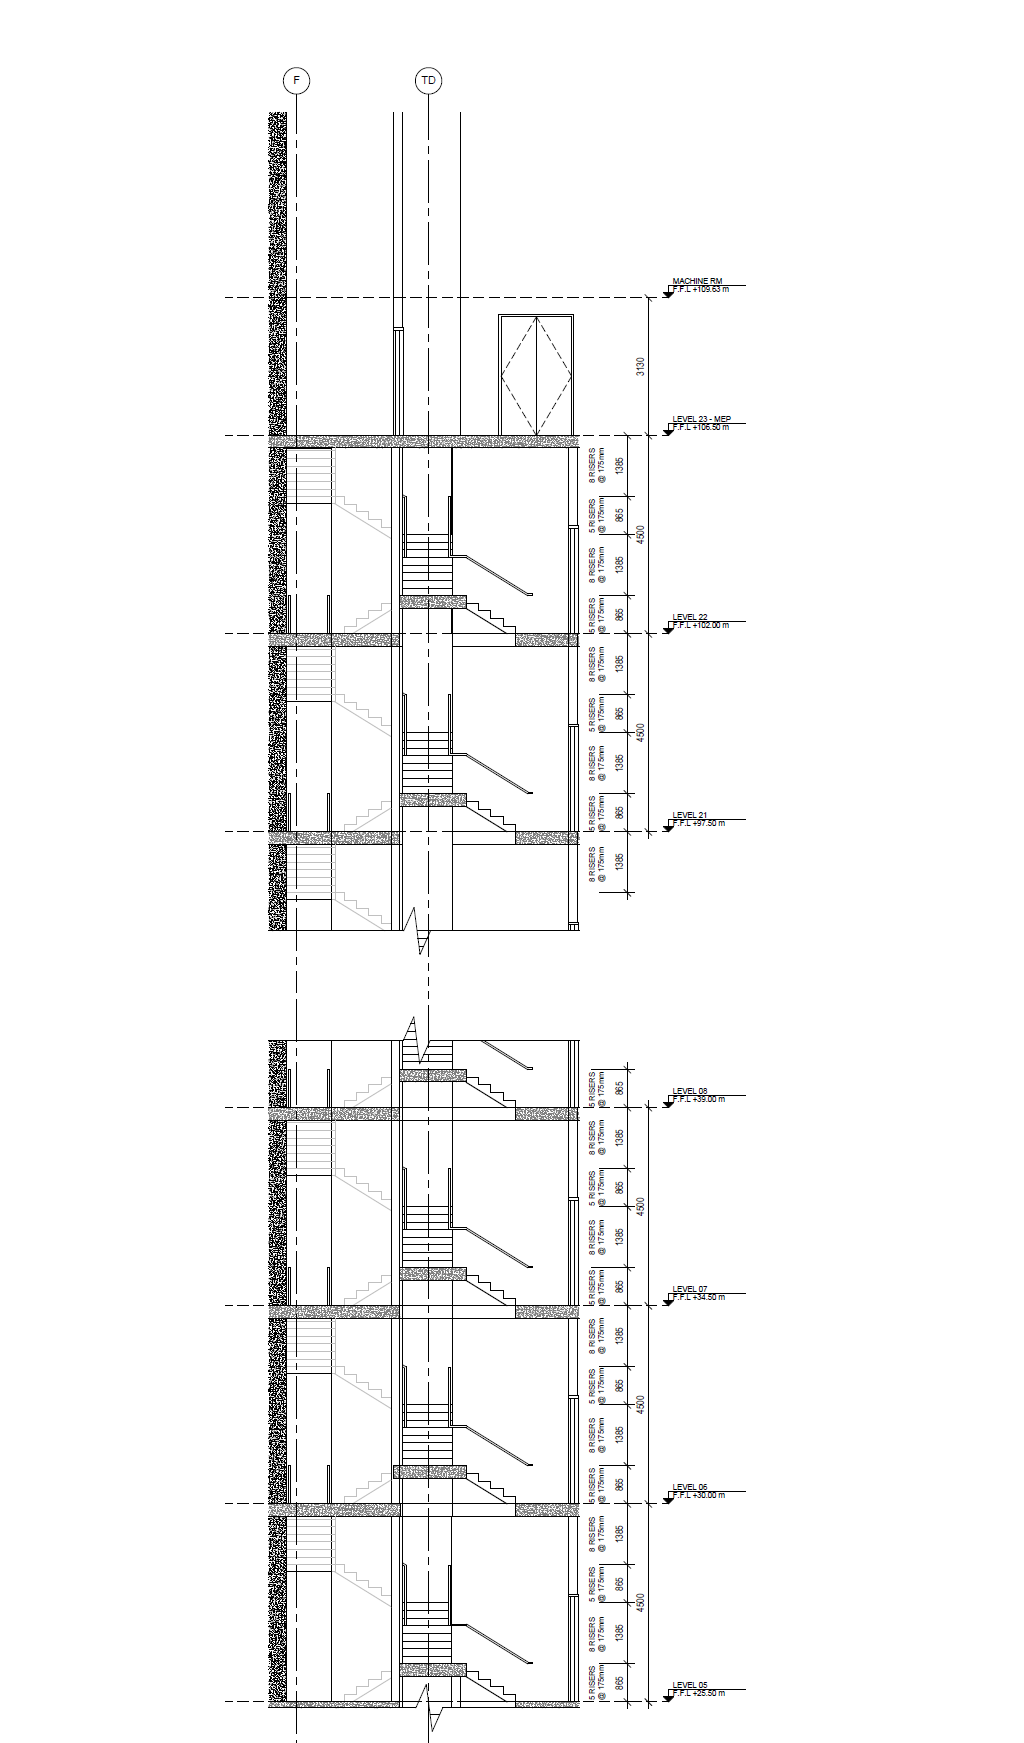 2019-02-09 06_57_38-STAIR 4 SECTION 4 .pdf - Adobe Acrobat Pro DC.png